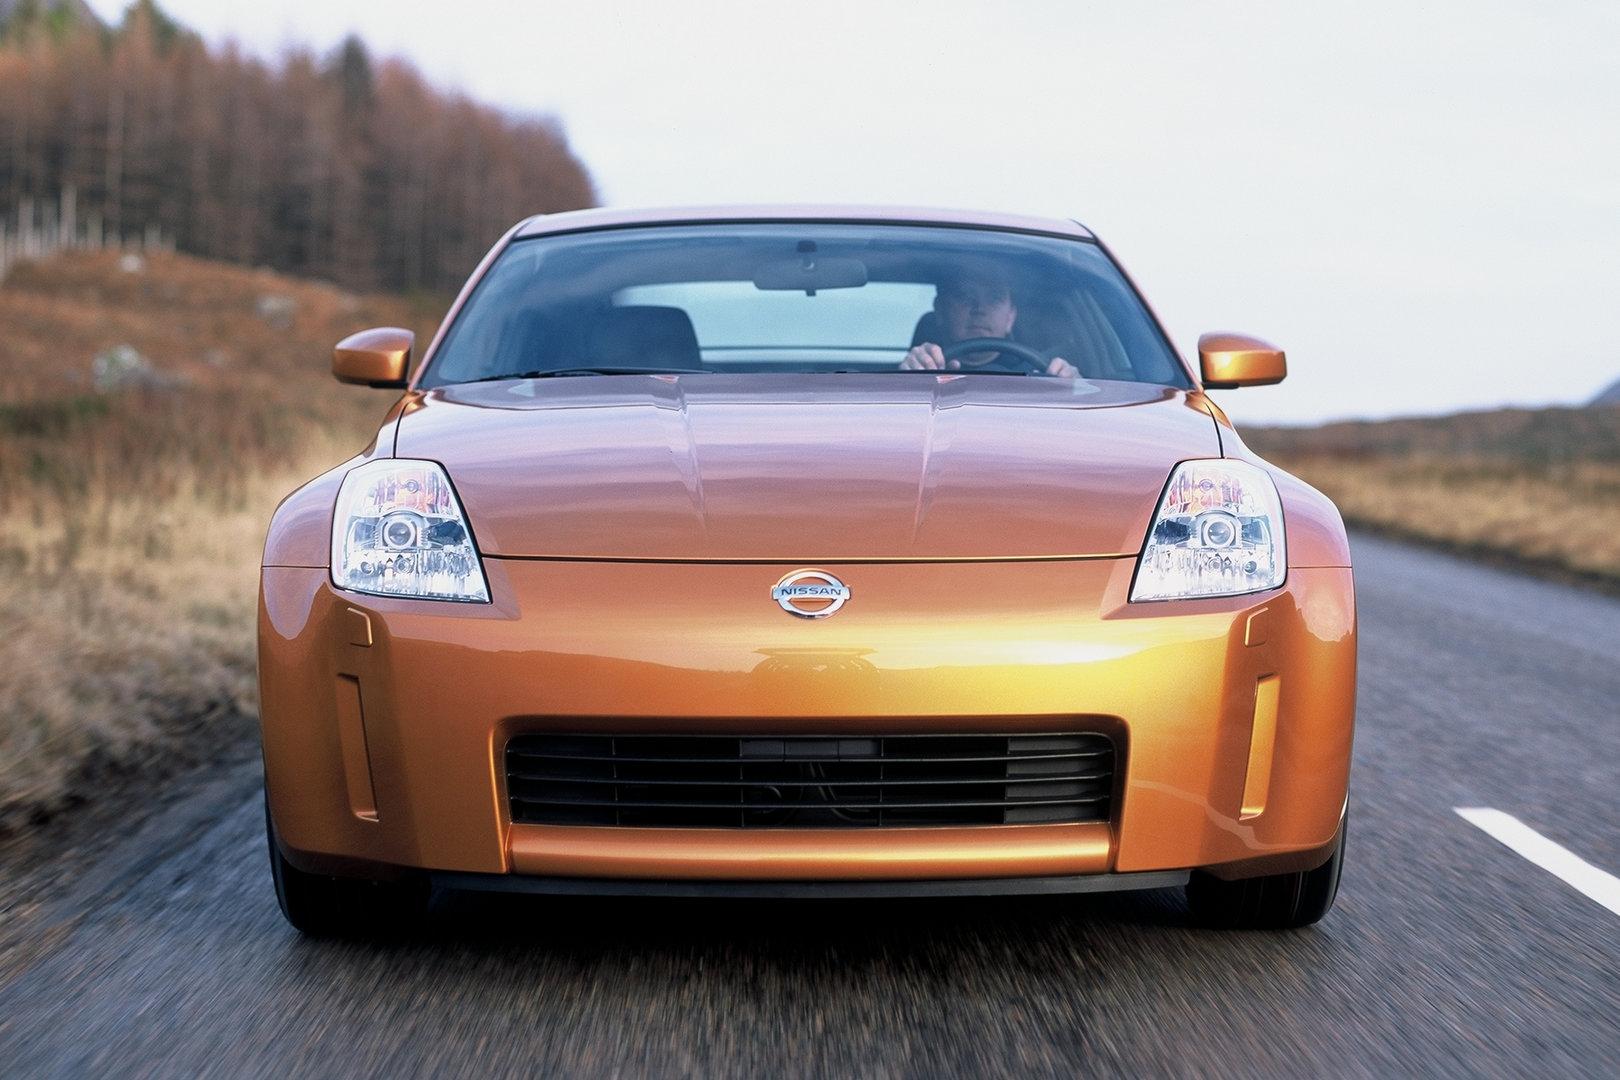 Coche del día: Nissan 350Z Coupé (Z33)